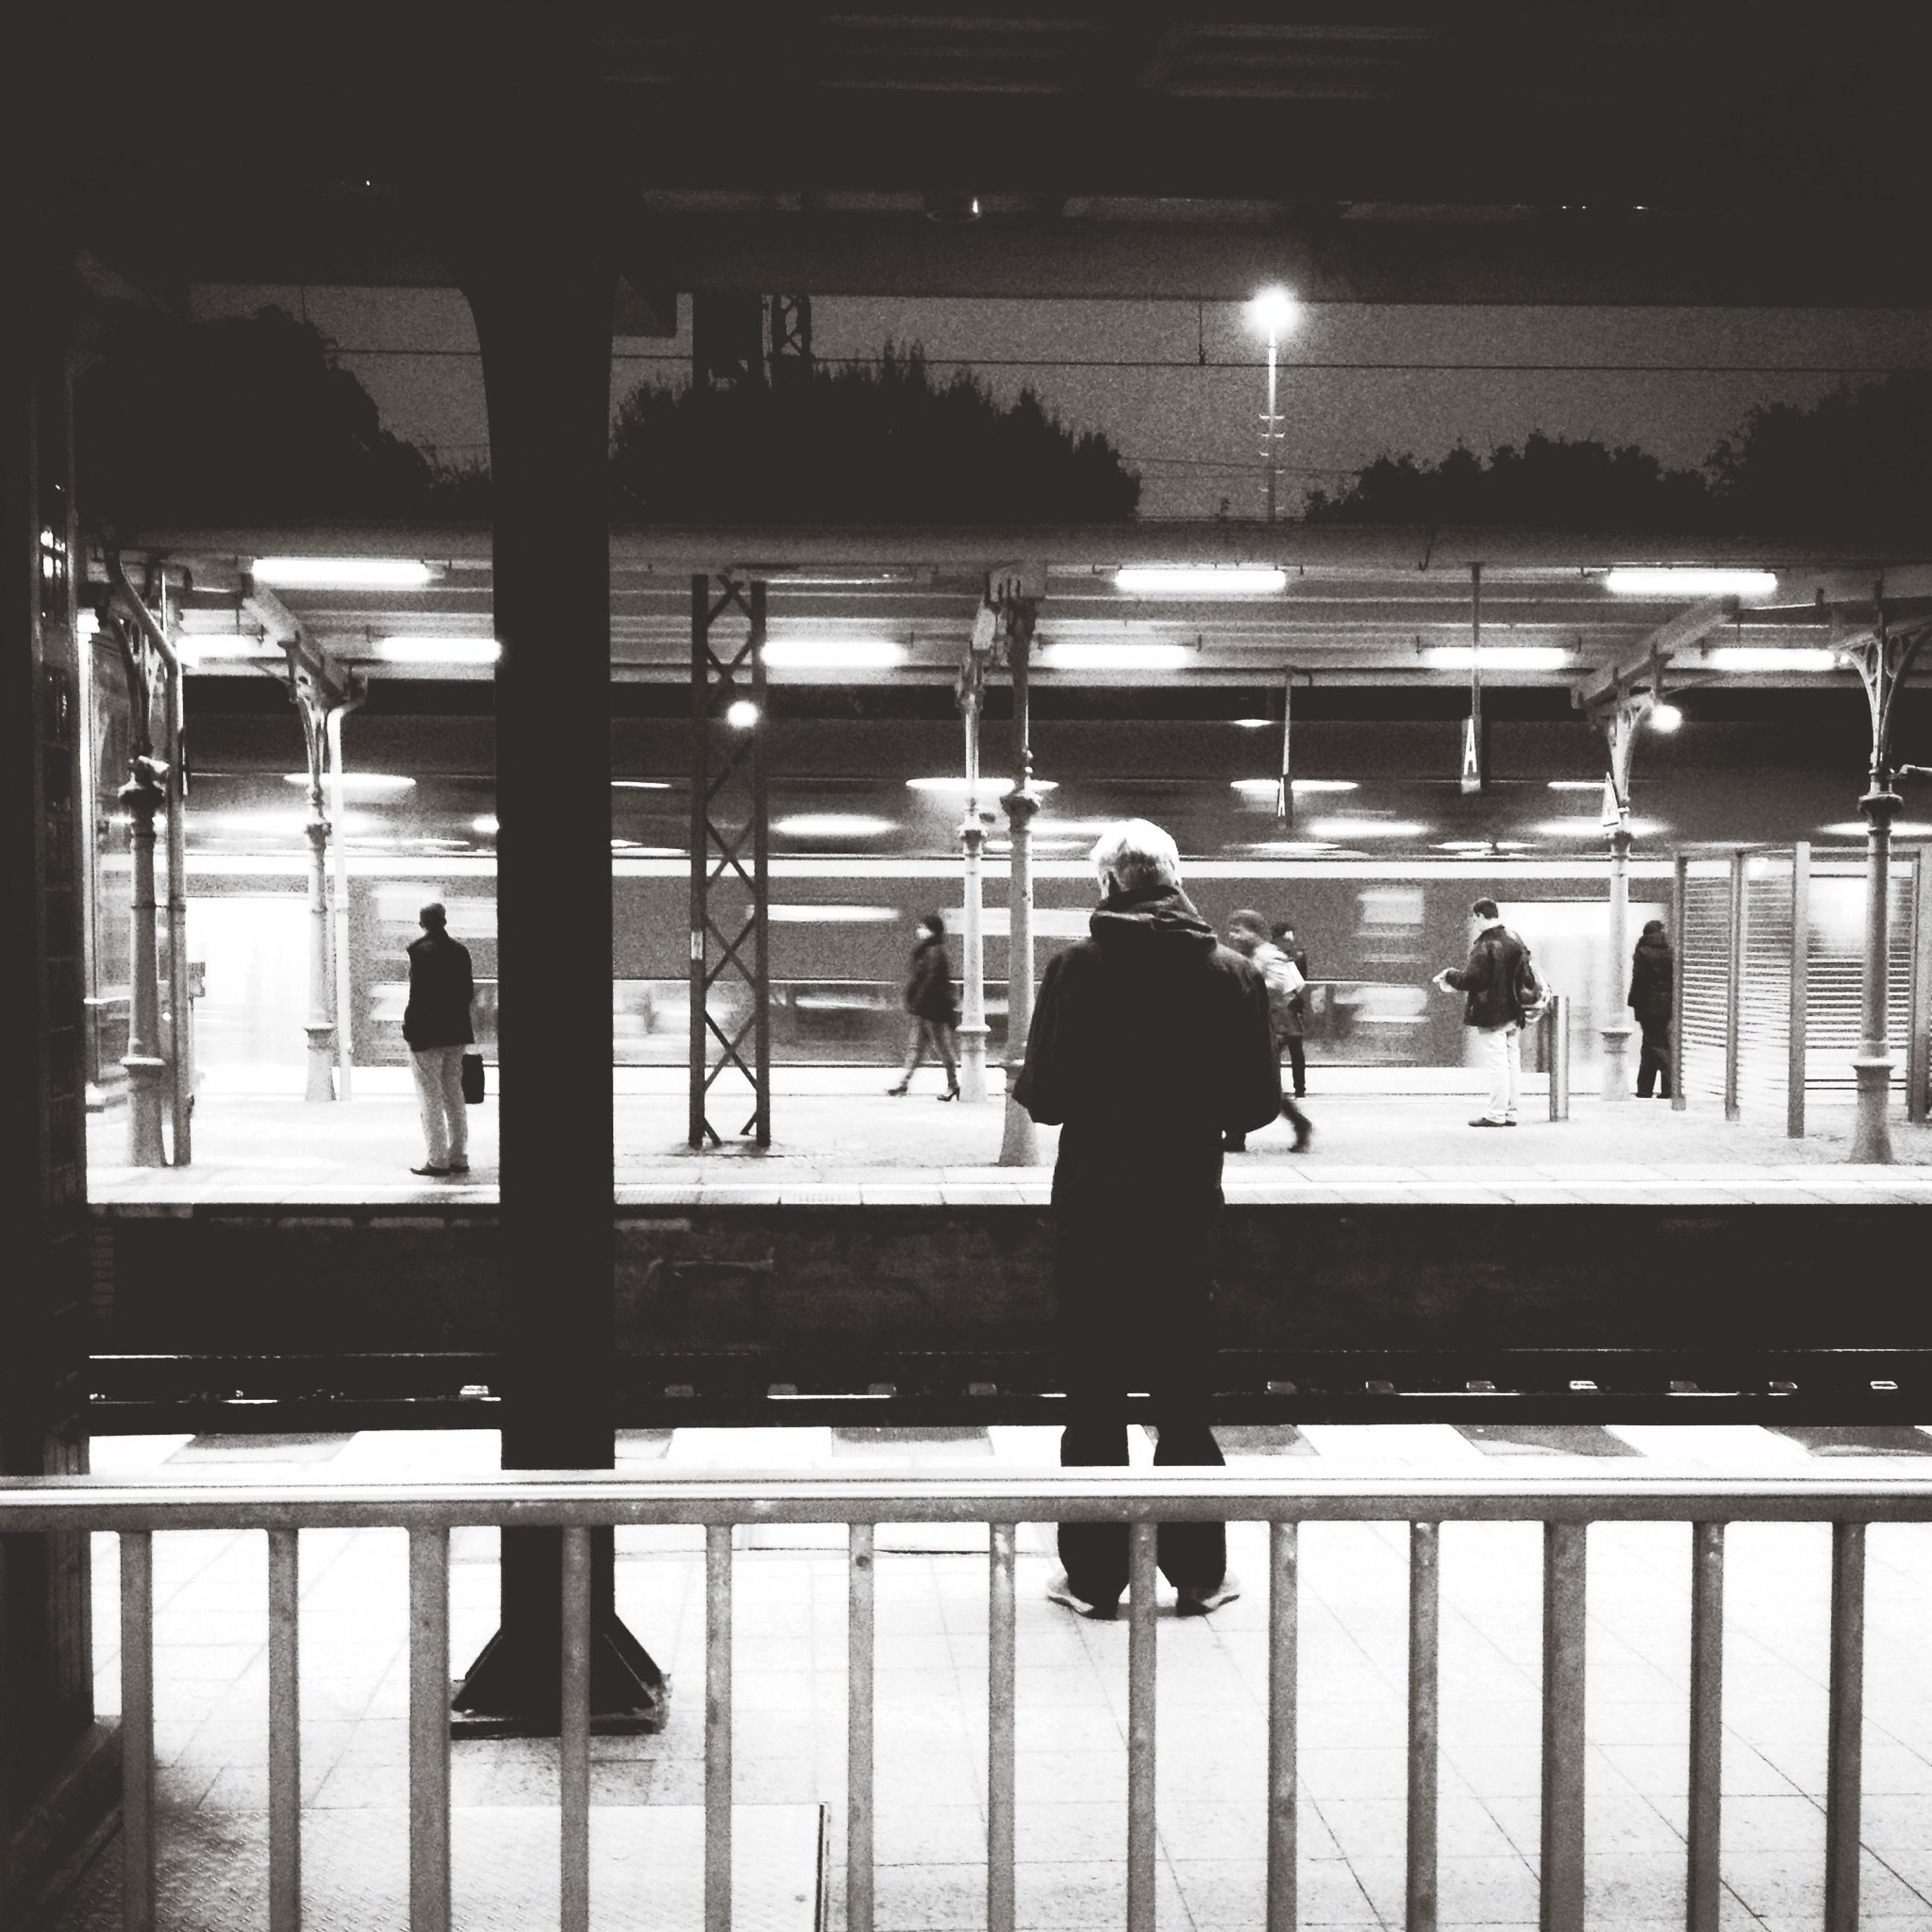 lifestyles, men, illuminated, person, leisure activity, night, full length, indoors, silhouette, city life, walking, railroad station platform, city, rear view, railroad station, built structure, standing, architecture, airport